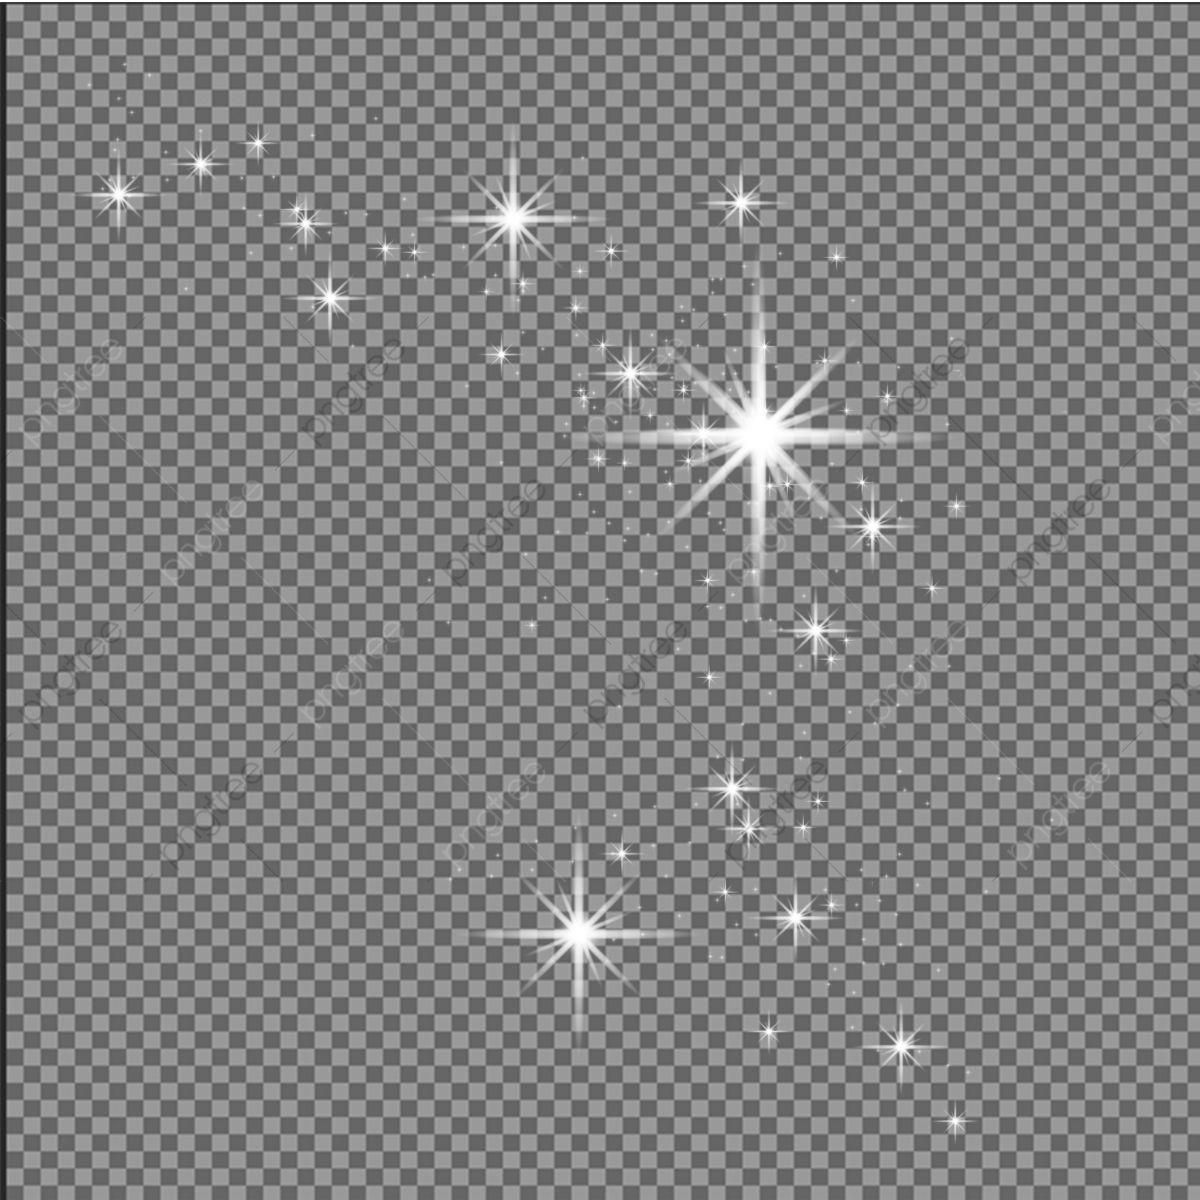 Sparkles Sparks Sparkling Star Png Transparent Clipart Image And Psd File For Free Download Sparkle Png Sparkle Image Overlays Transparent